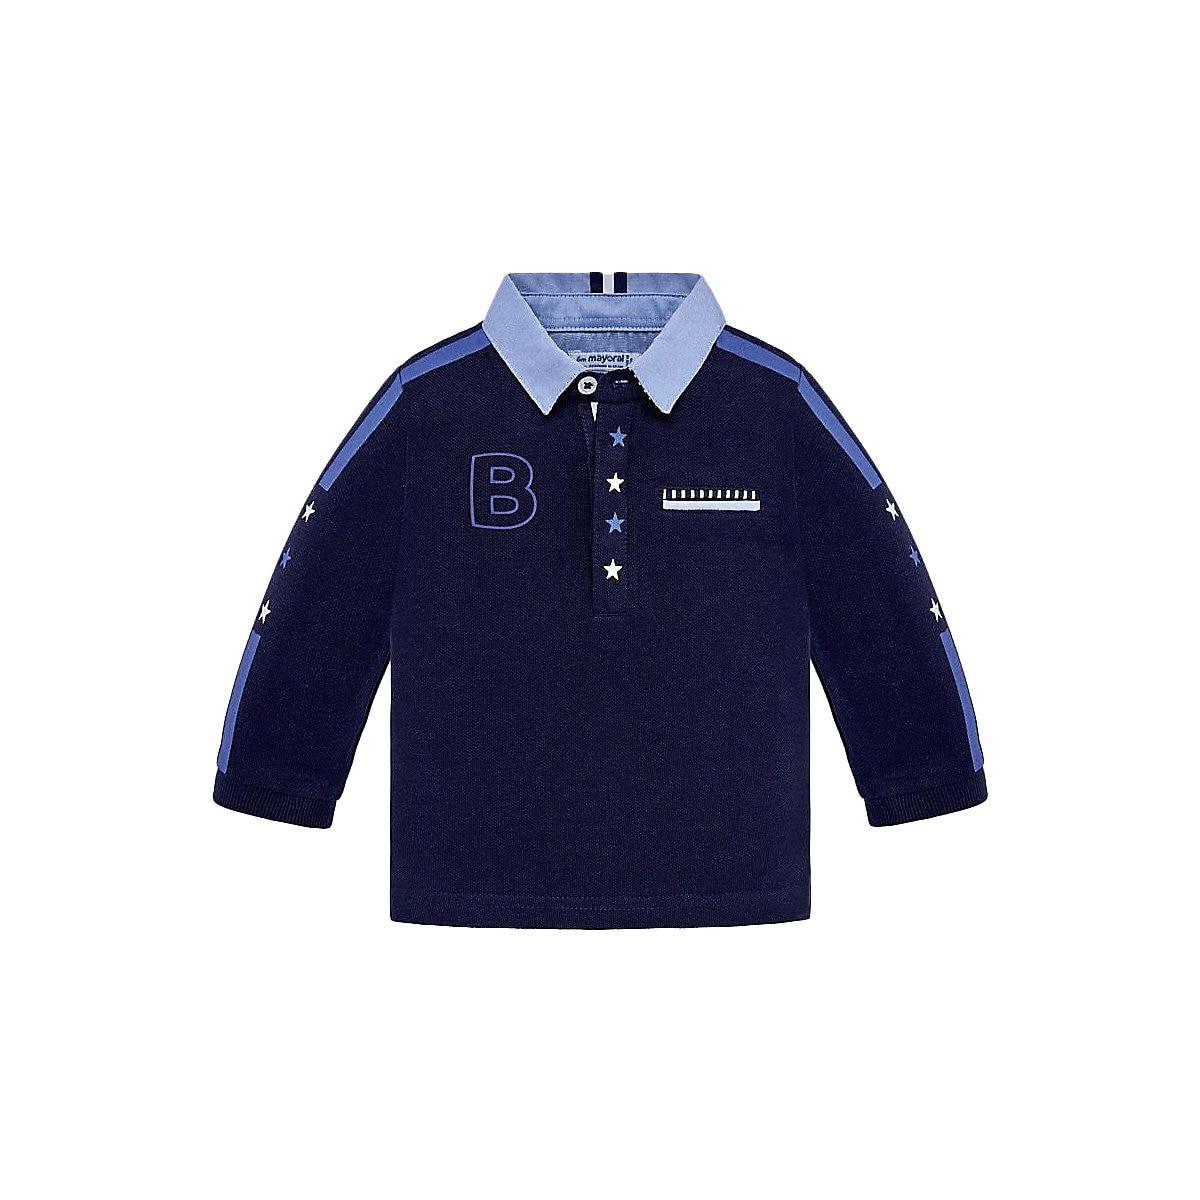 MAYORAL Polo Shirts 10685245 children clothing t-shirt shirt the print for boys tiger 3d print basic t shirt